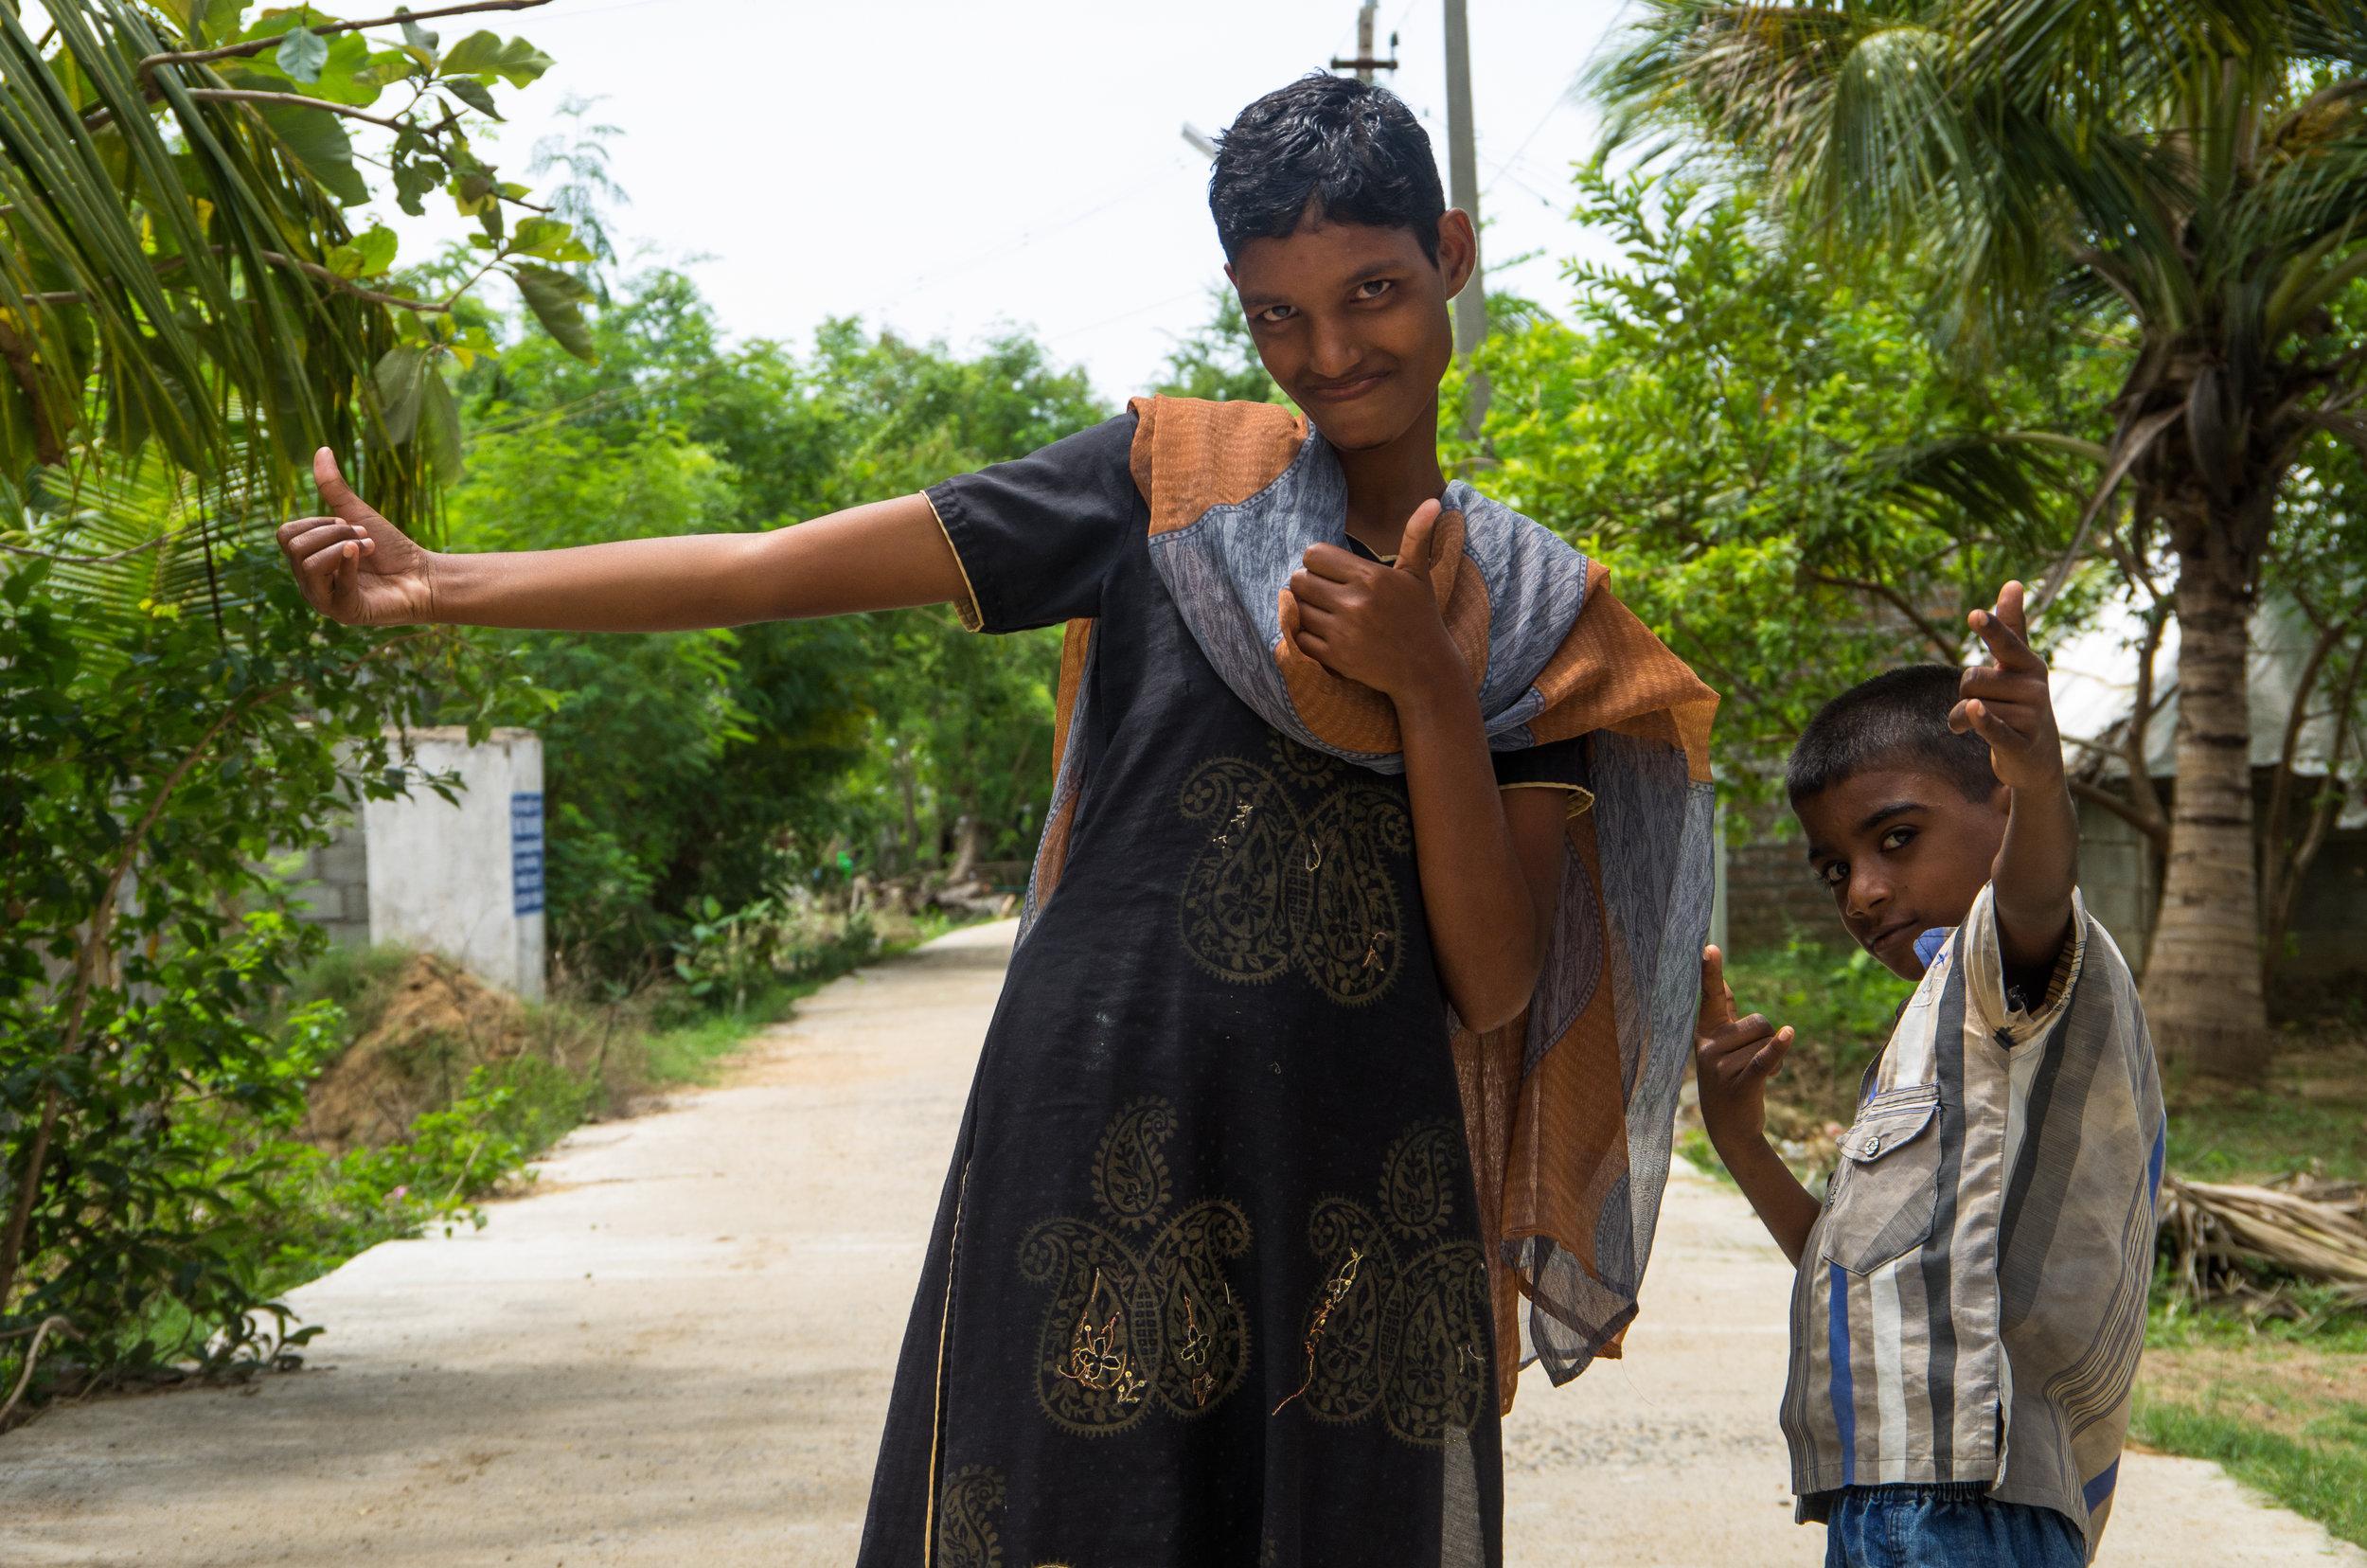 Nandhini and Satish strike a pose